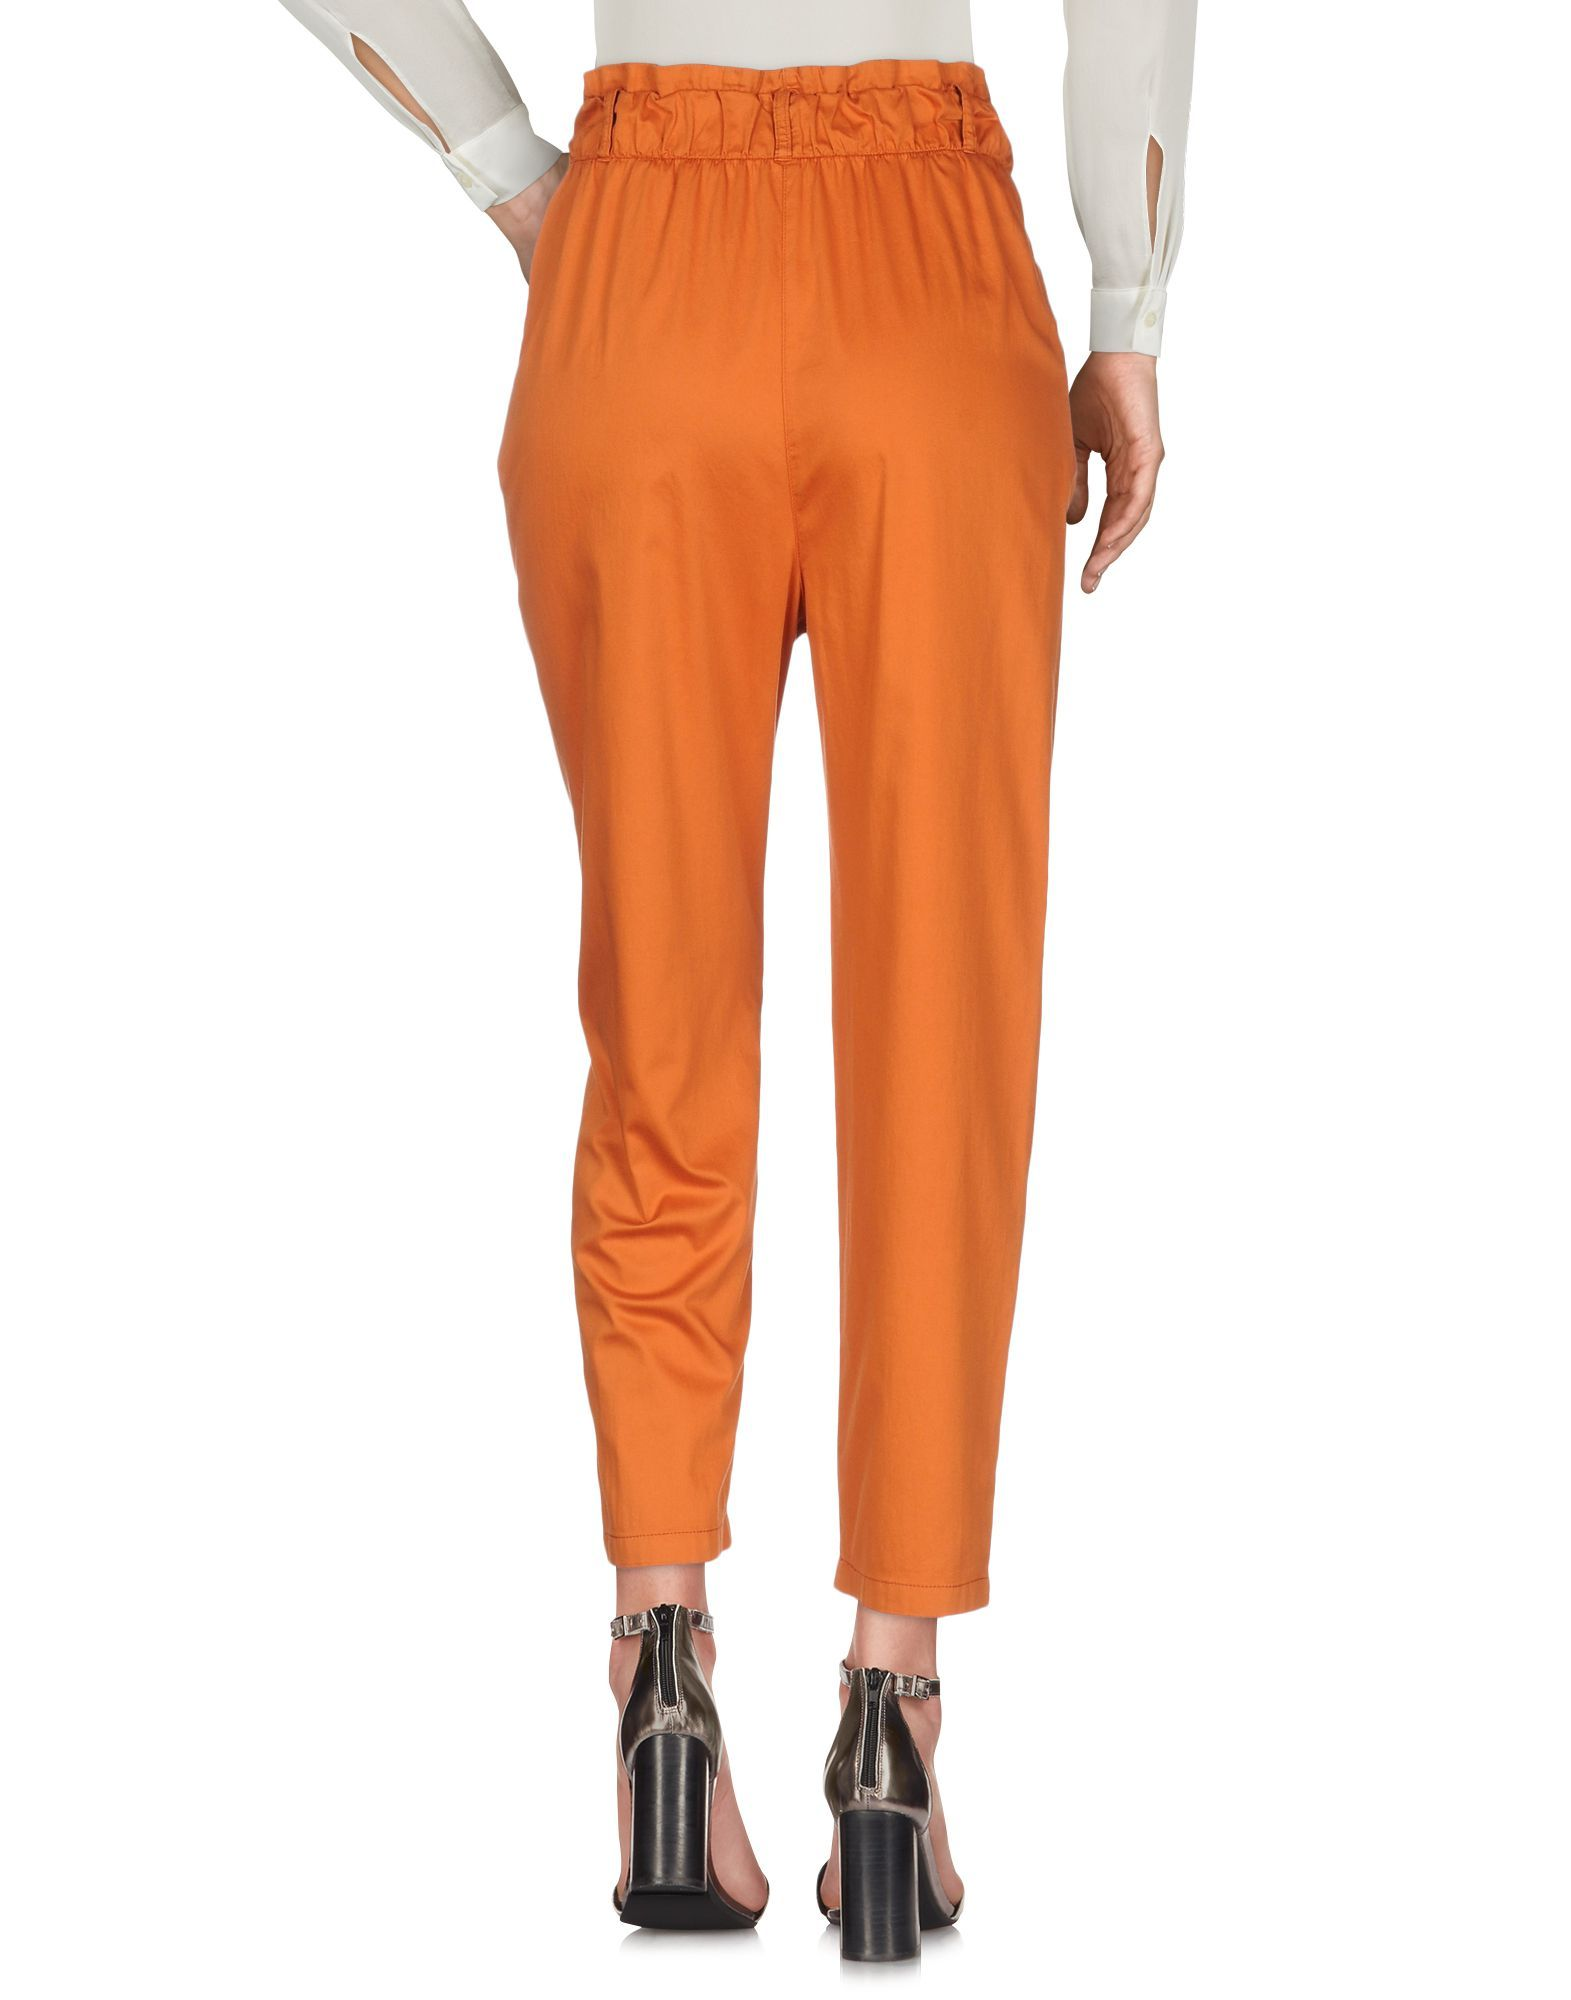 TROUSERS Woman Atos Lombardini Orange Cotton